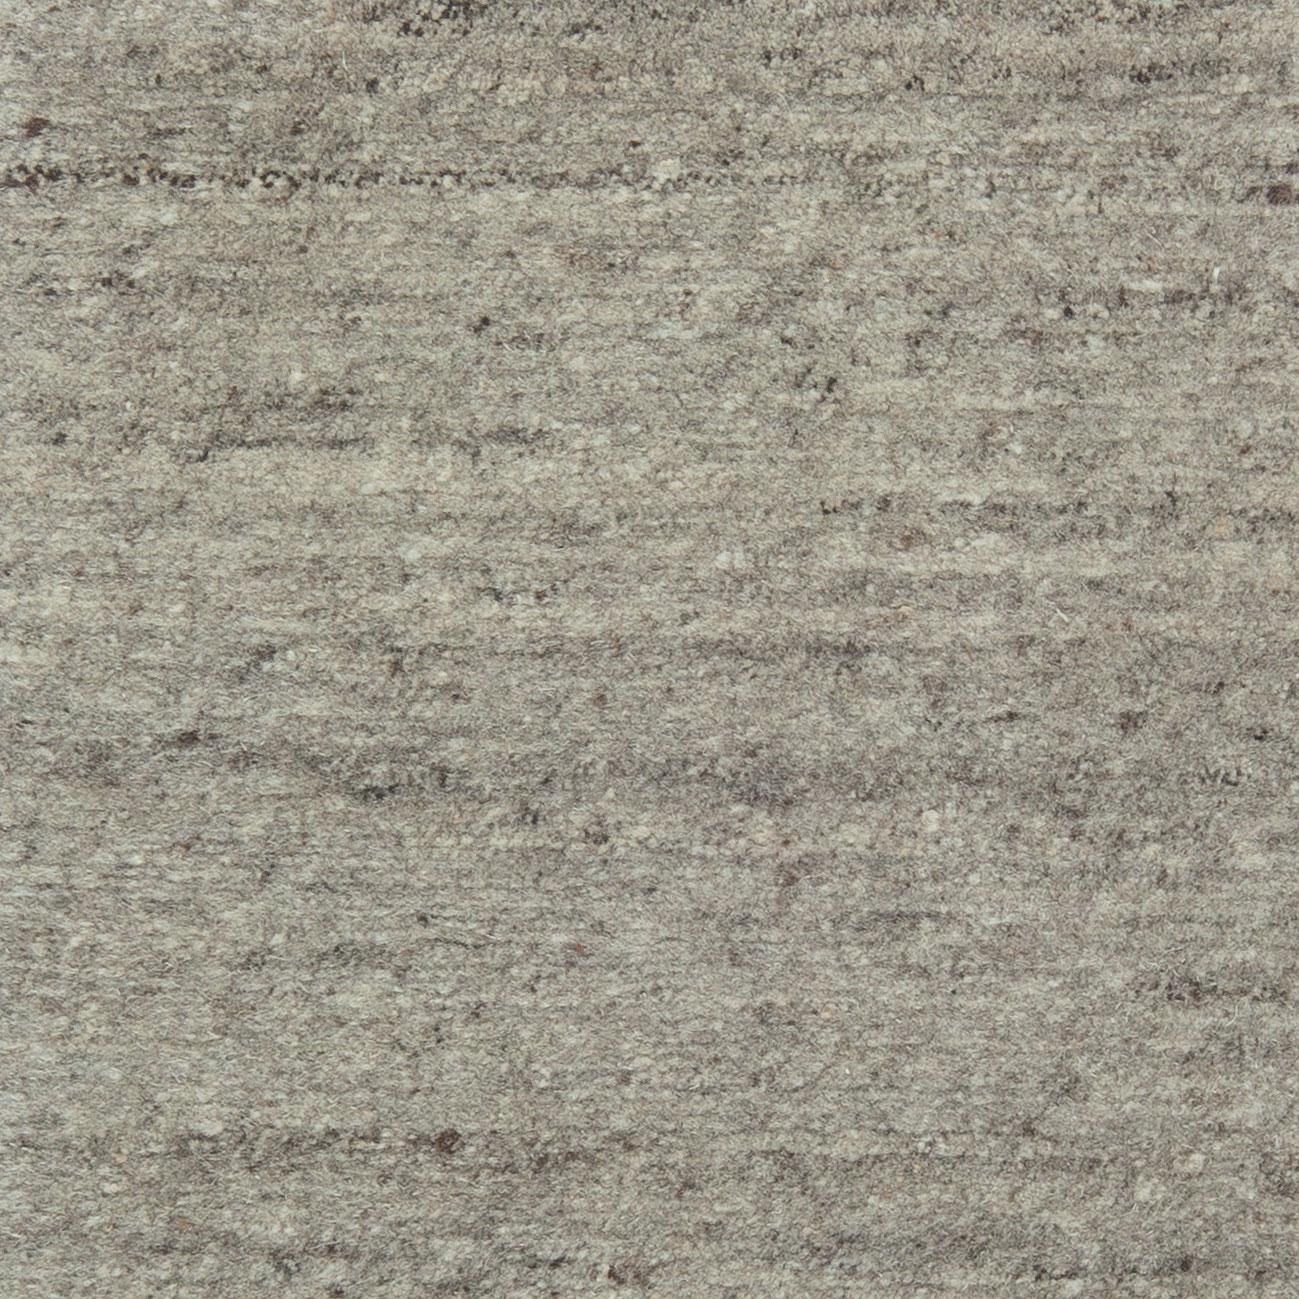 Tweed Custom Rug Design S11881 S11881